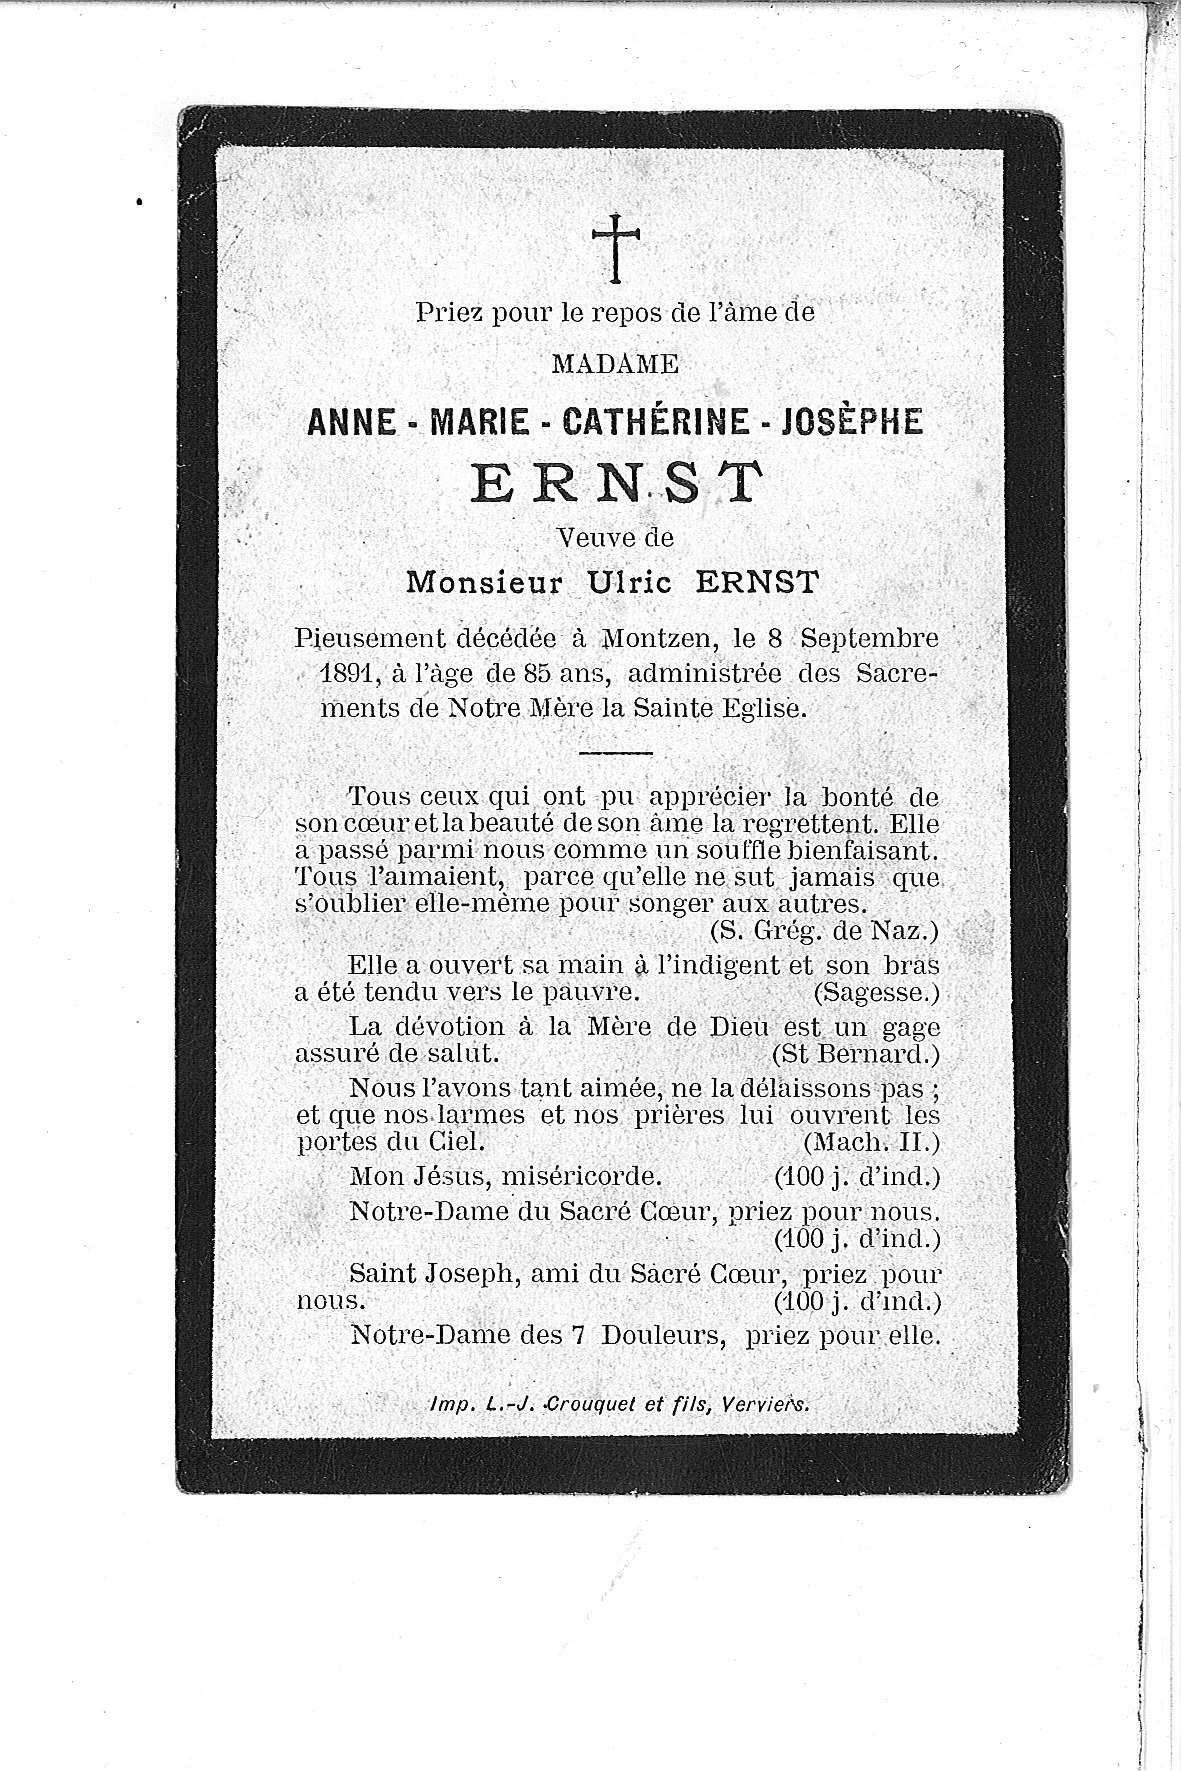 Anne-Marie-Cathérine-Josèphe(1891)20101110144310_00005.jpg